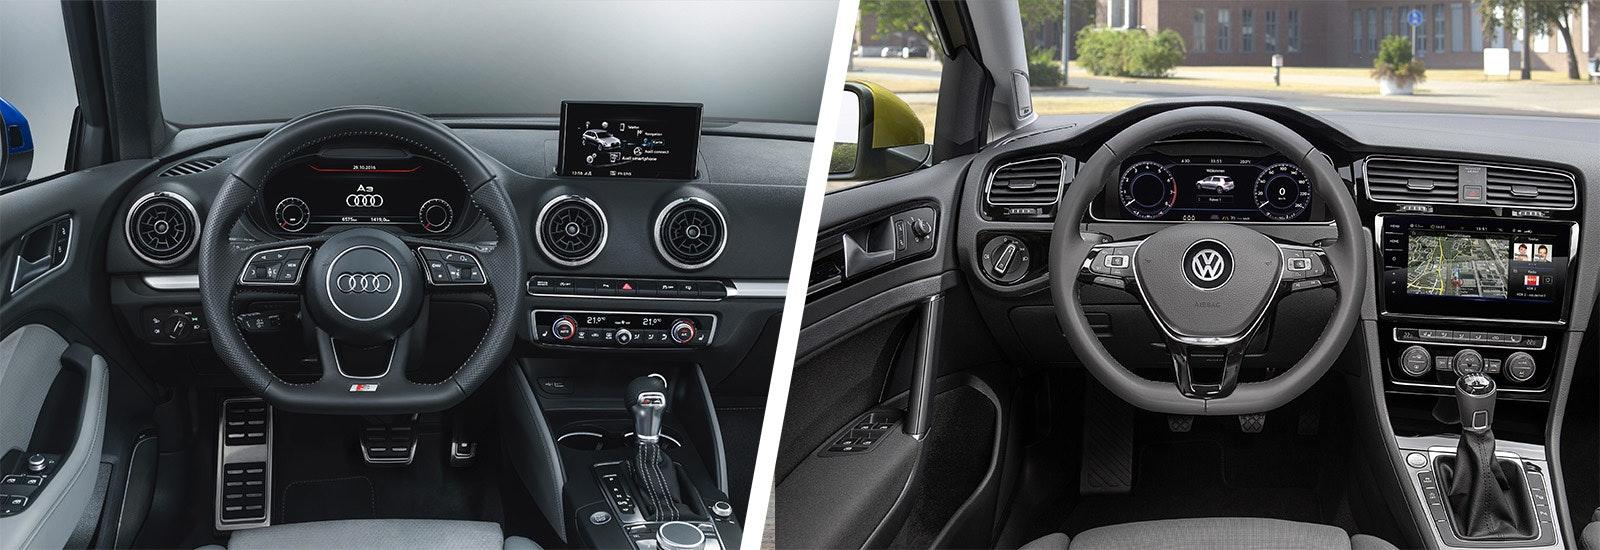 Audi A3 Vs VW Golf U2013 Side By Side Comparison | Carwow